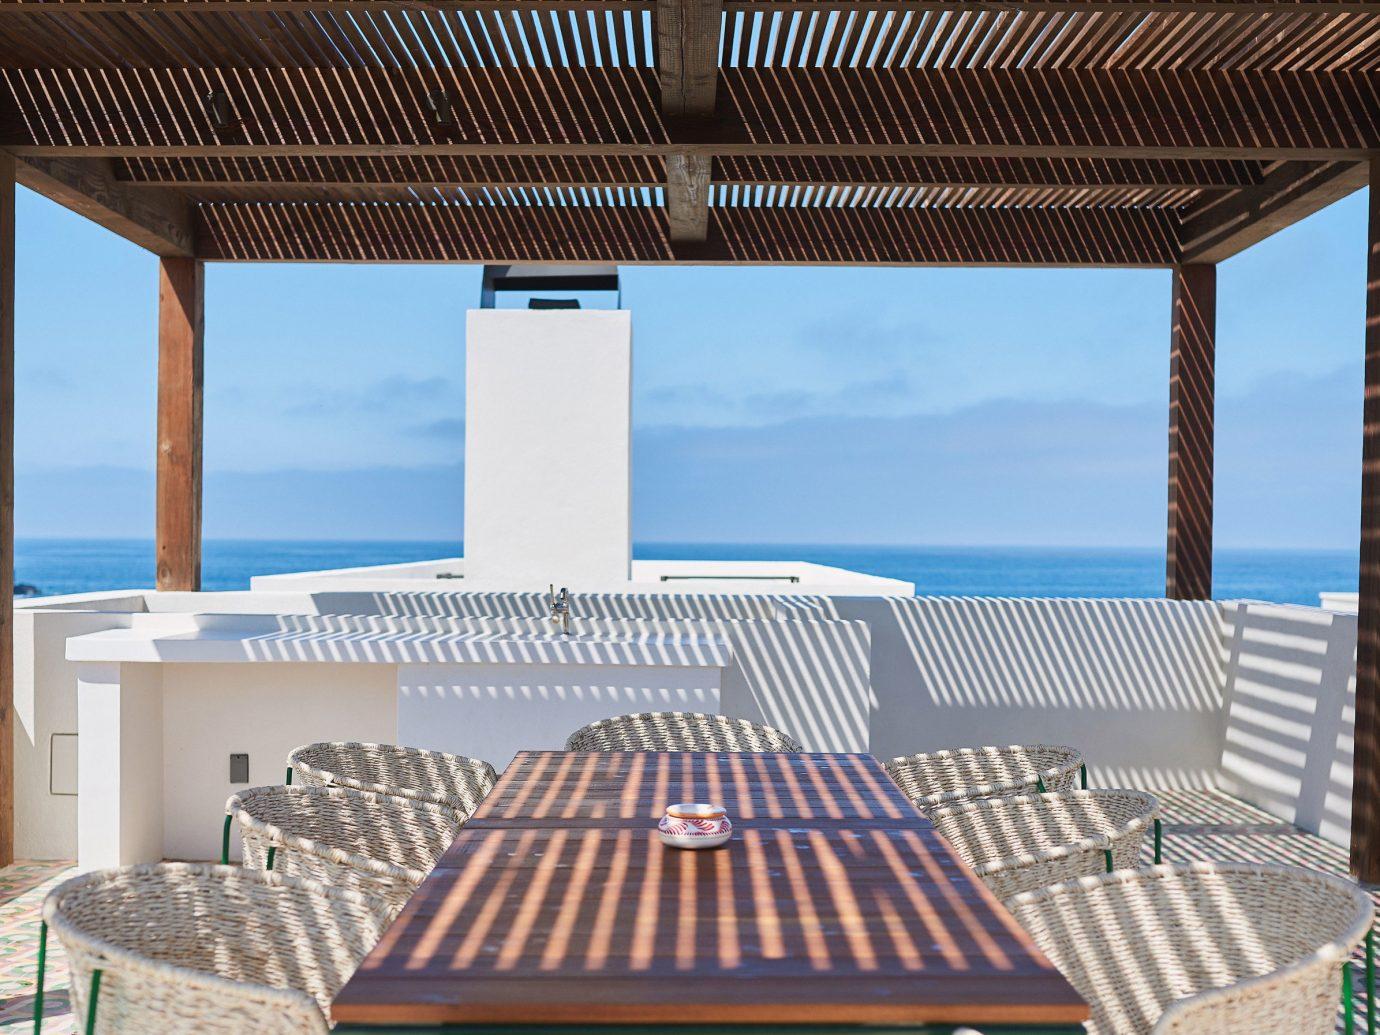 Trip Ideas chair property Resort swimming pool estate outdoor structure Villa interior design yacht Deck furniture